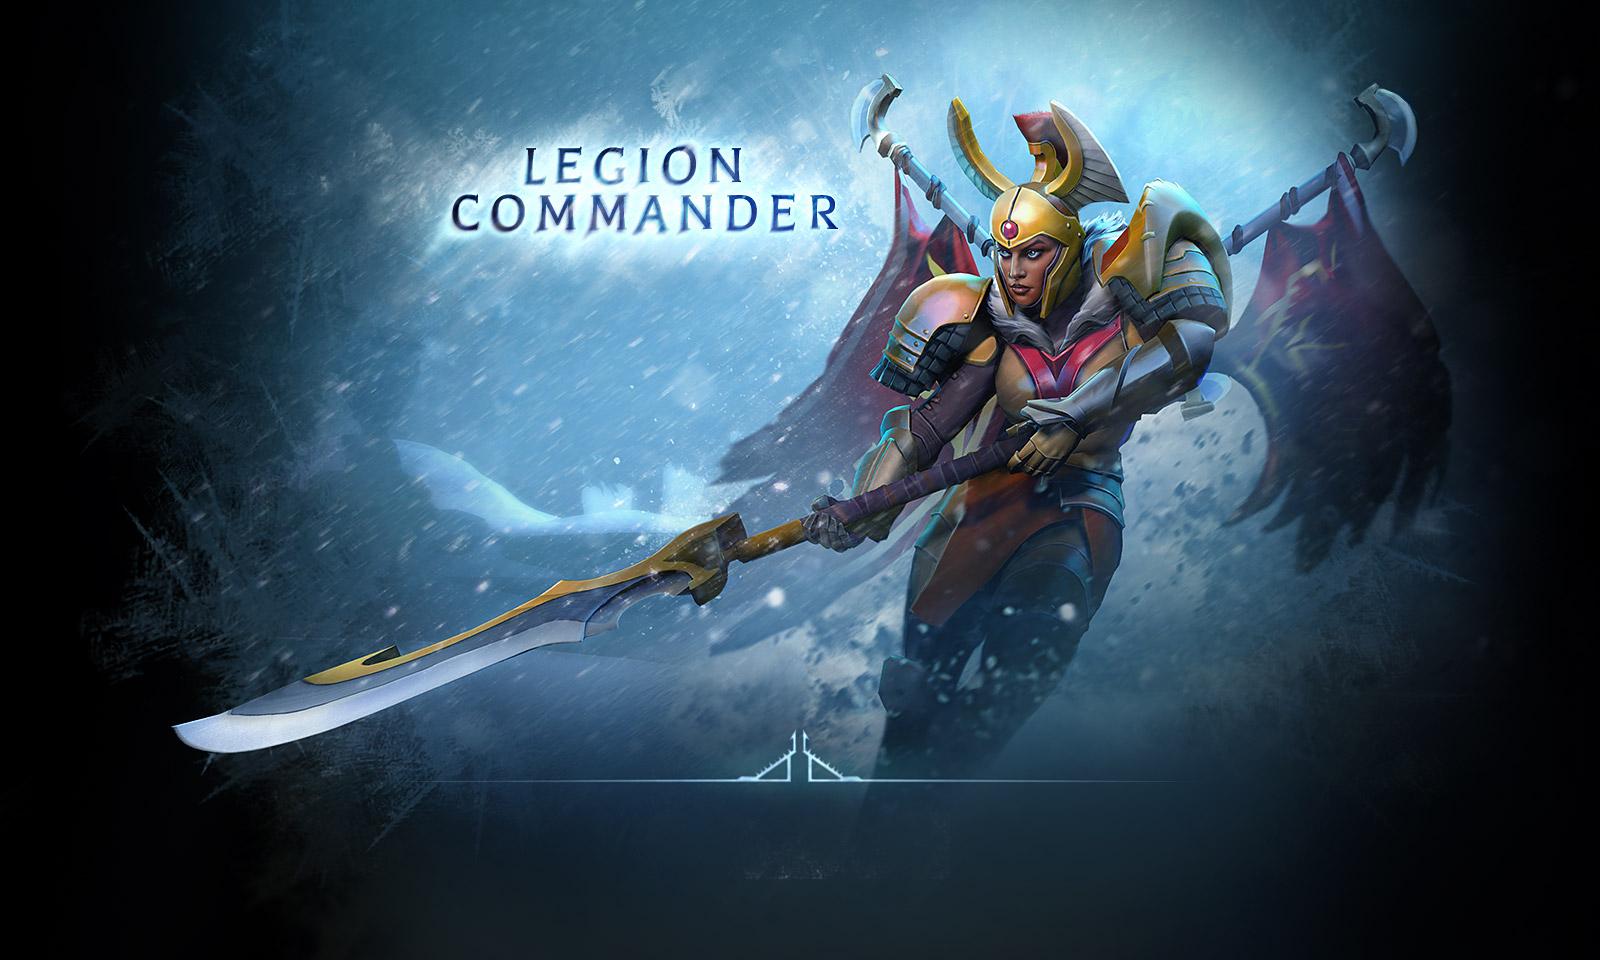 Legion Commander Wallpaper DotA2